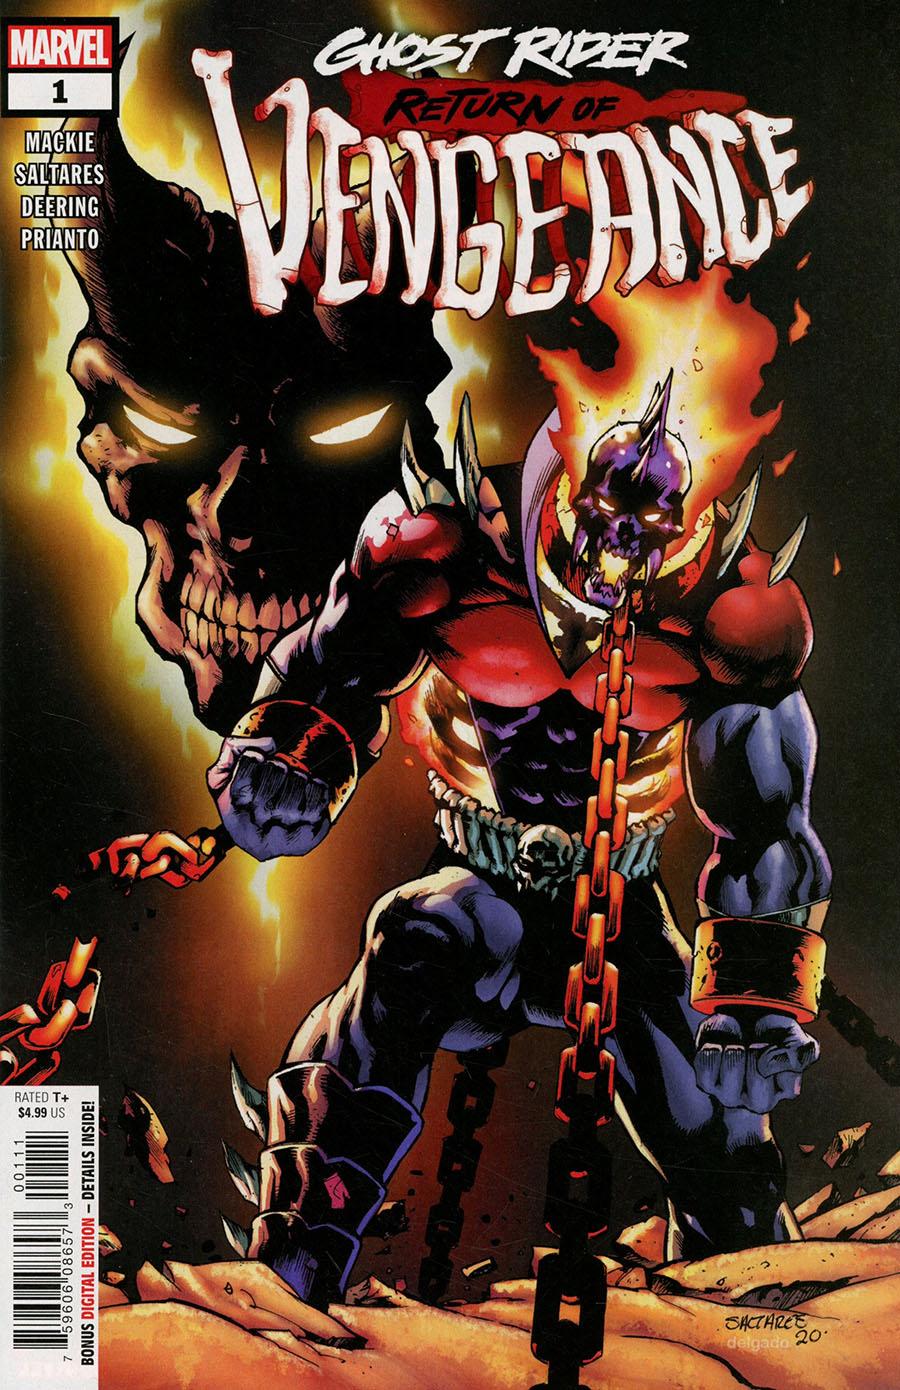 Ghost Rider Return Of Vengeance One Shot Cover A Regular Javier Saltares Cover